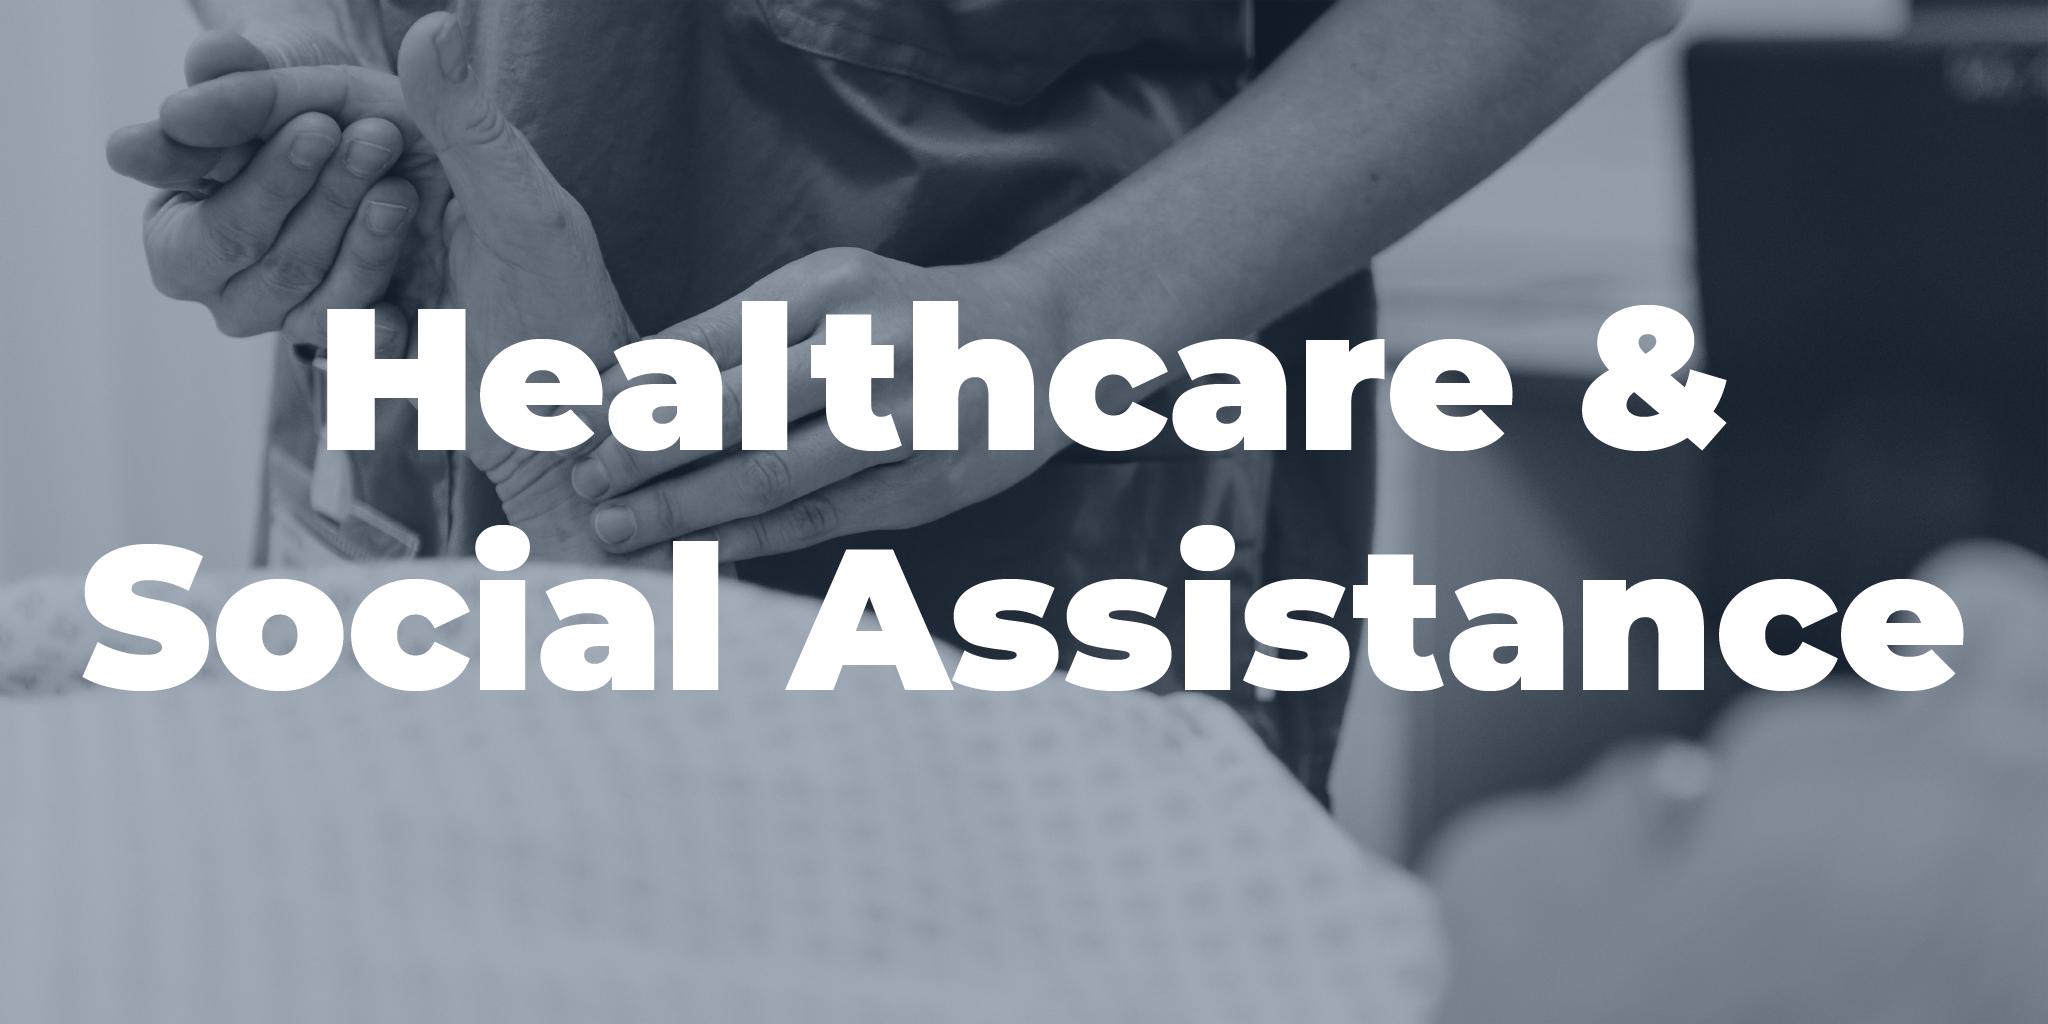 Healthcare & Social Assistance